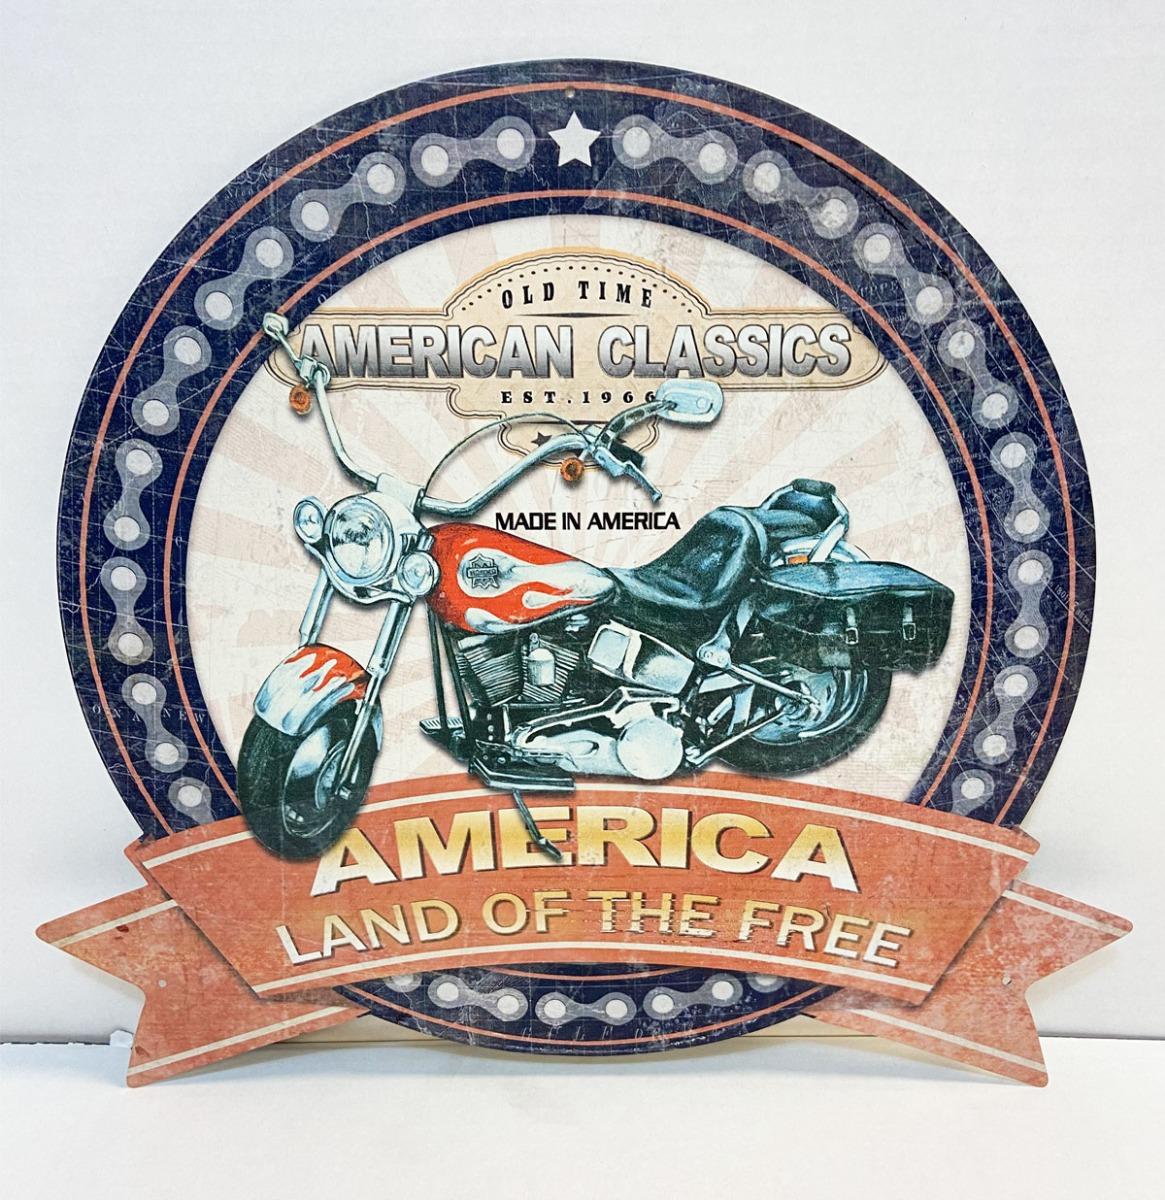 America Land Of The Free Motor Metaal Bord 39 x 36 cm